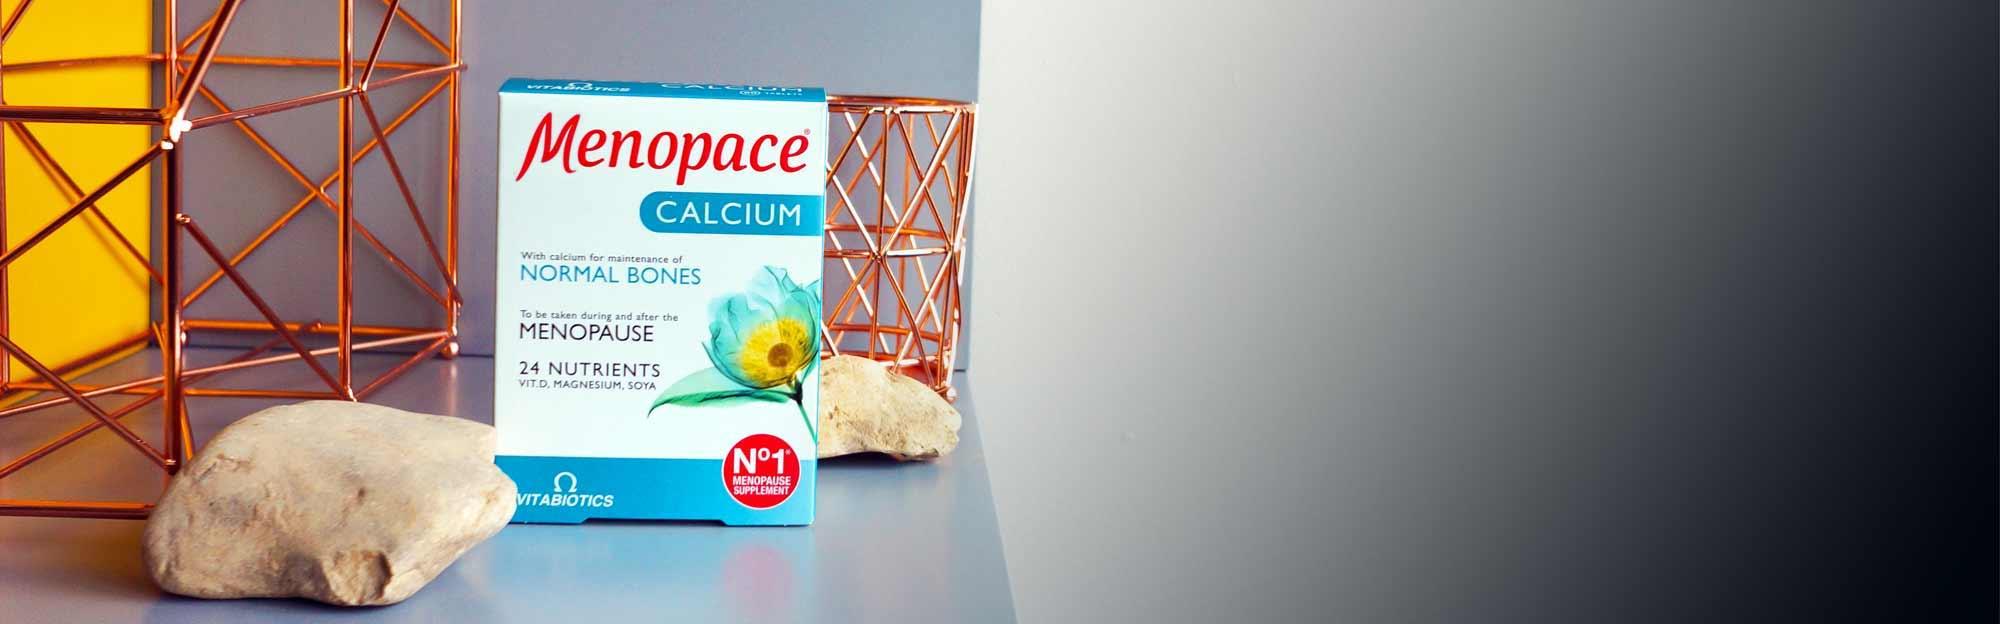 Menopace Calcium Pack On Display